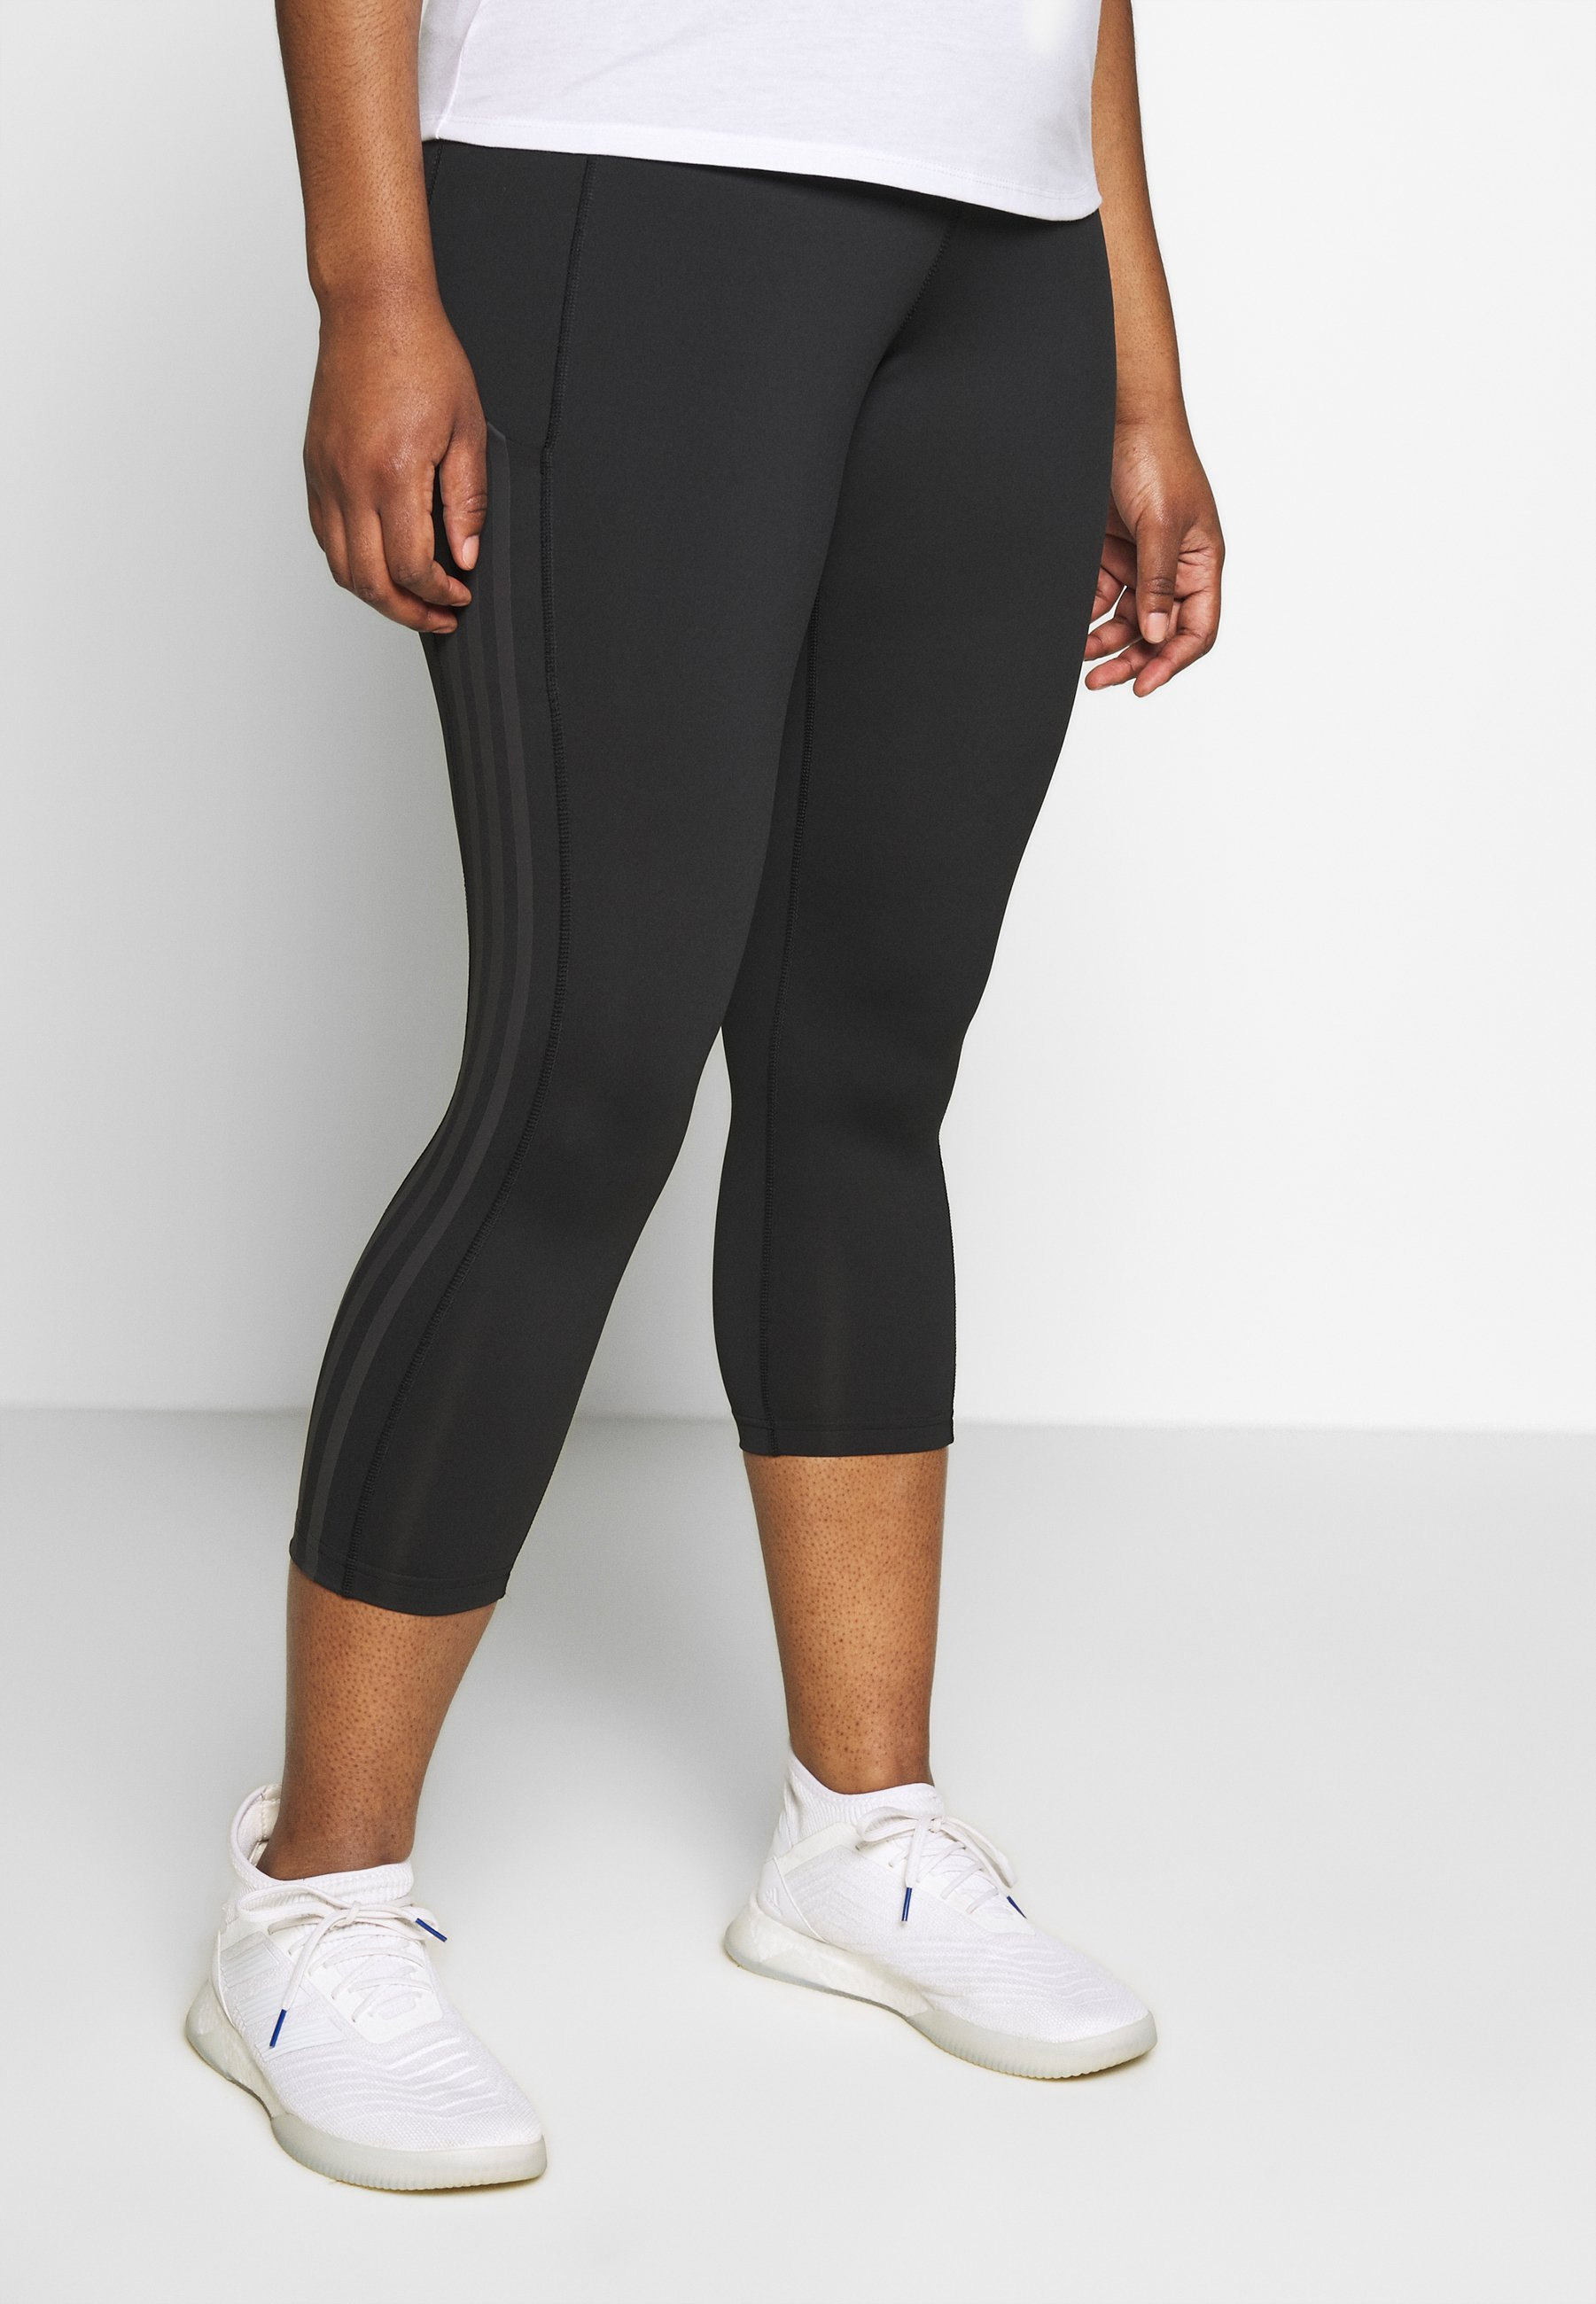 Bulk Designs Women's Clothing adidas Performance Leggings black EaG7KoYLk